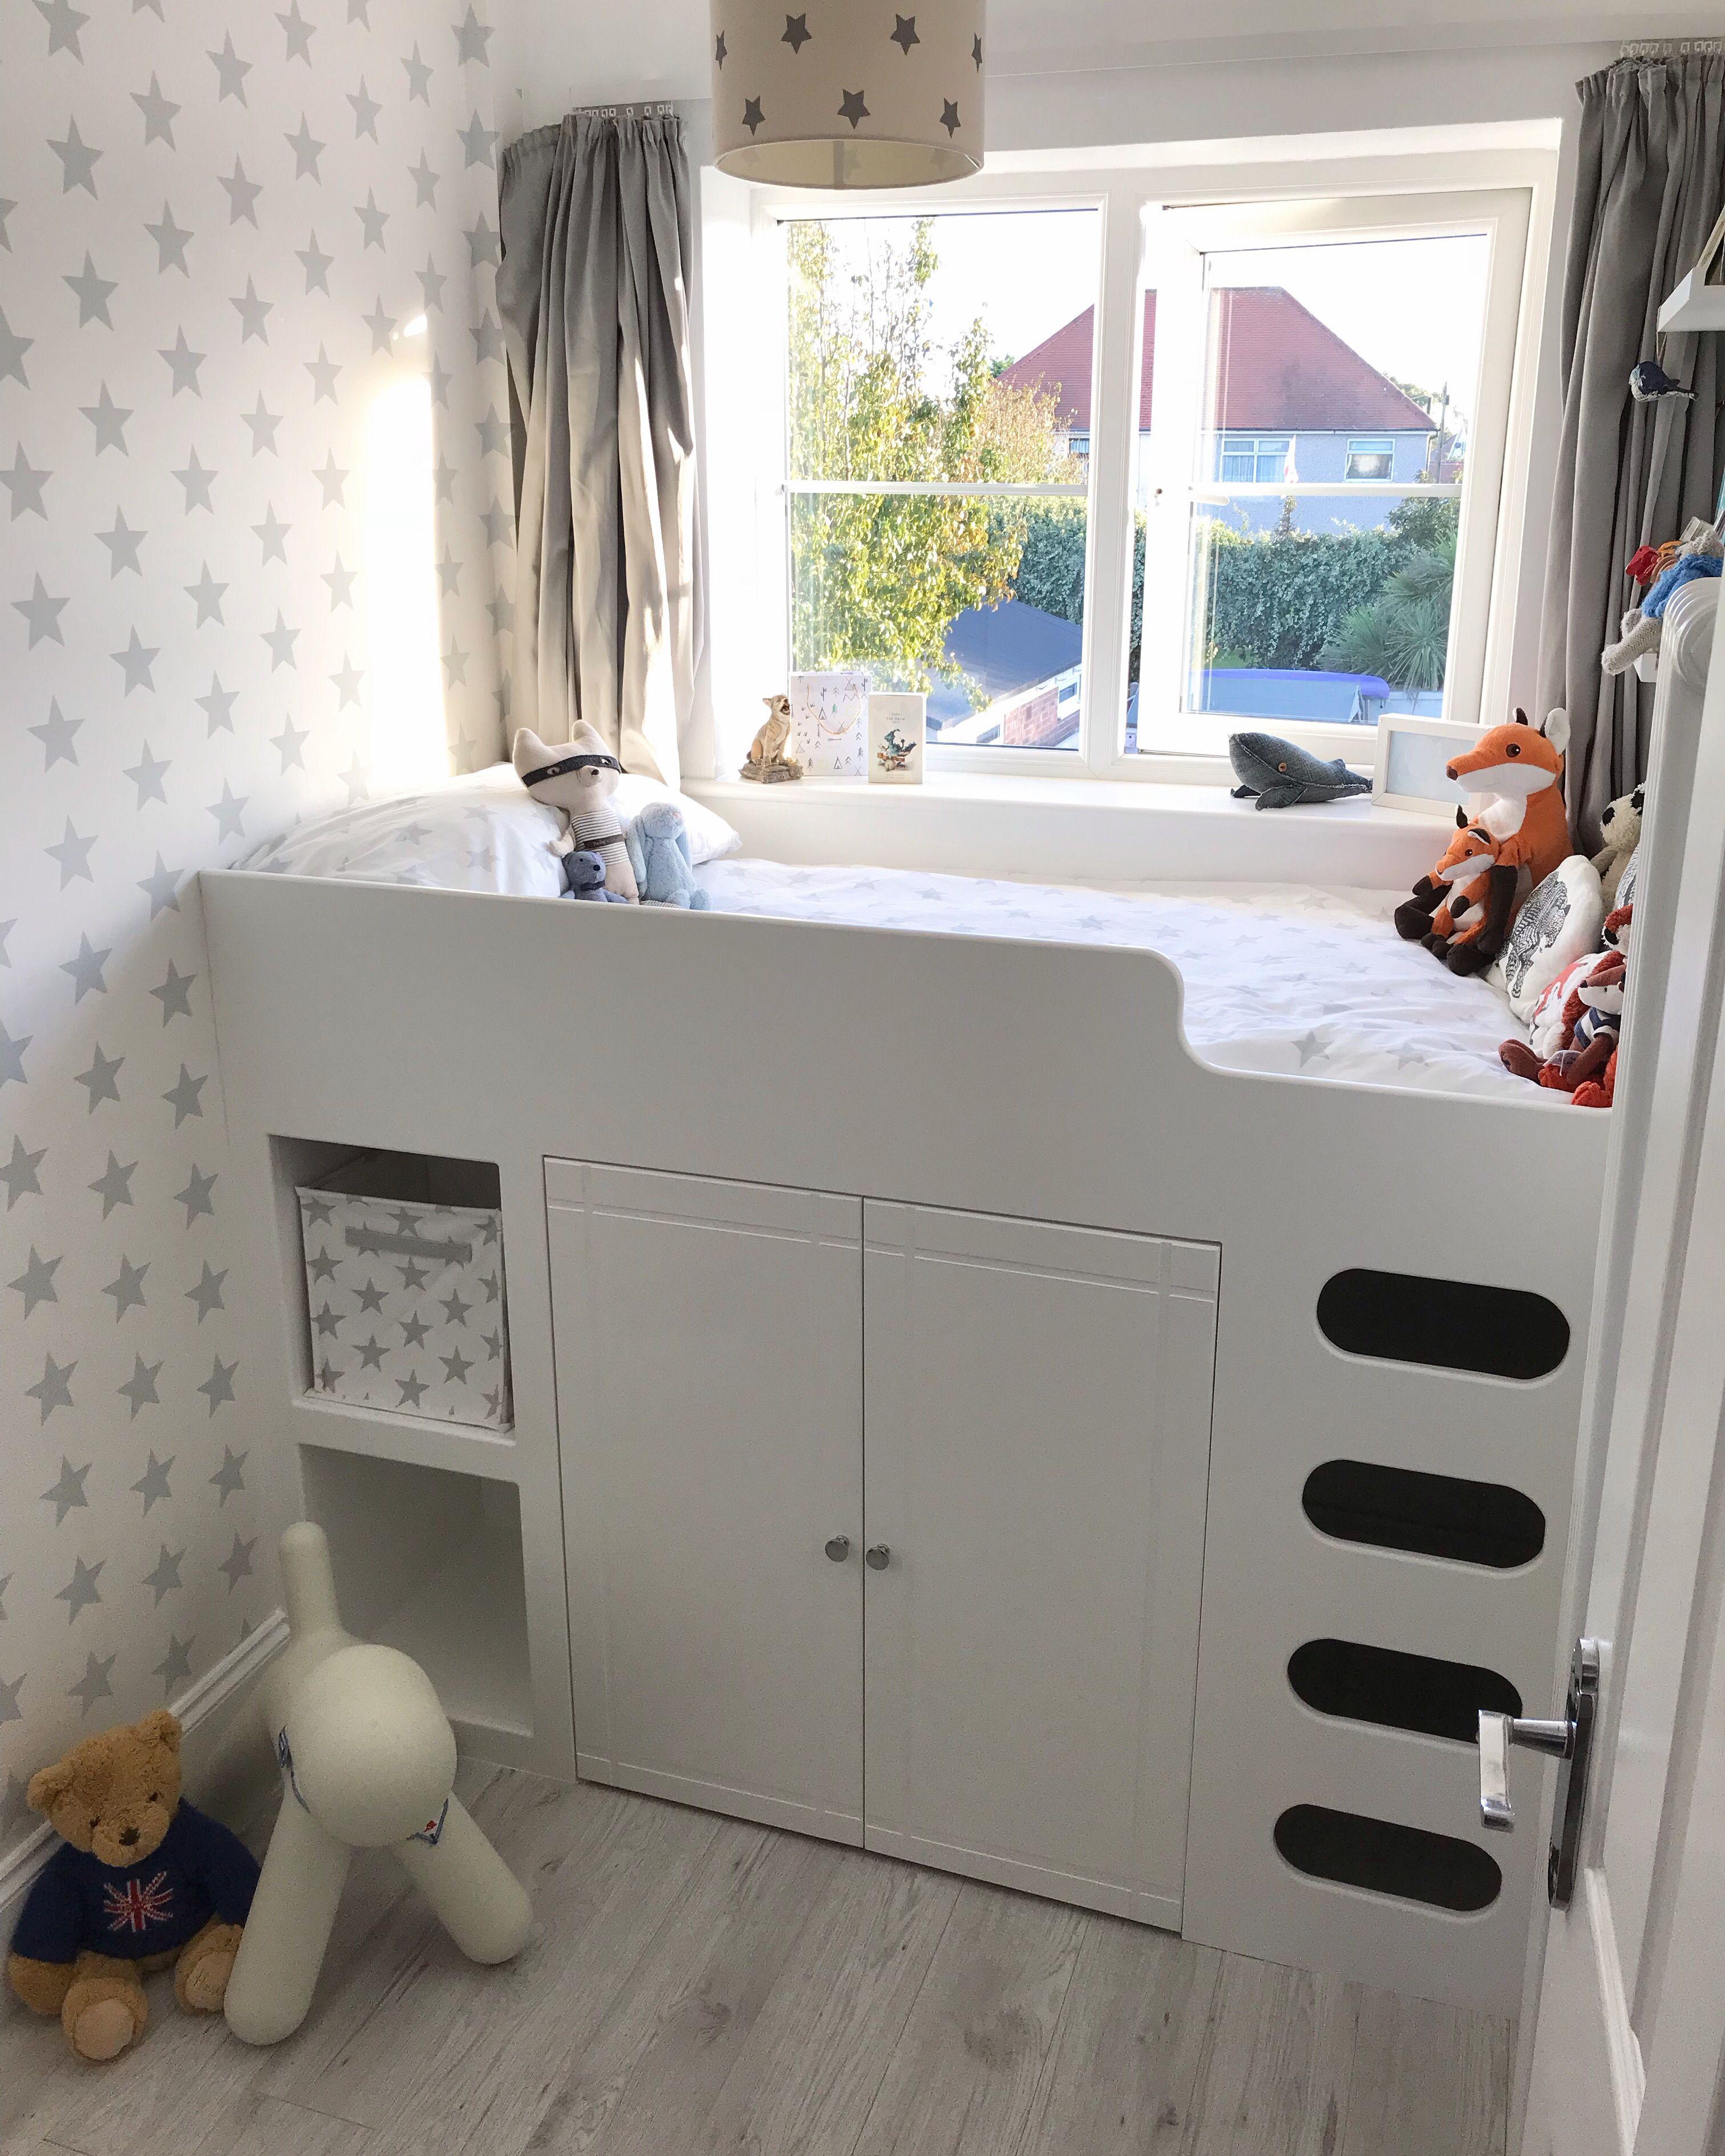 Tates Finished Room Box Room Bedroom Ideas Box Room Bedroom Ideas For Kids Box Bedroom